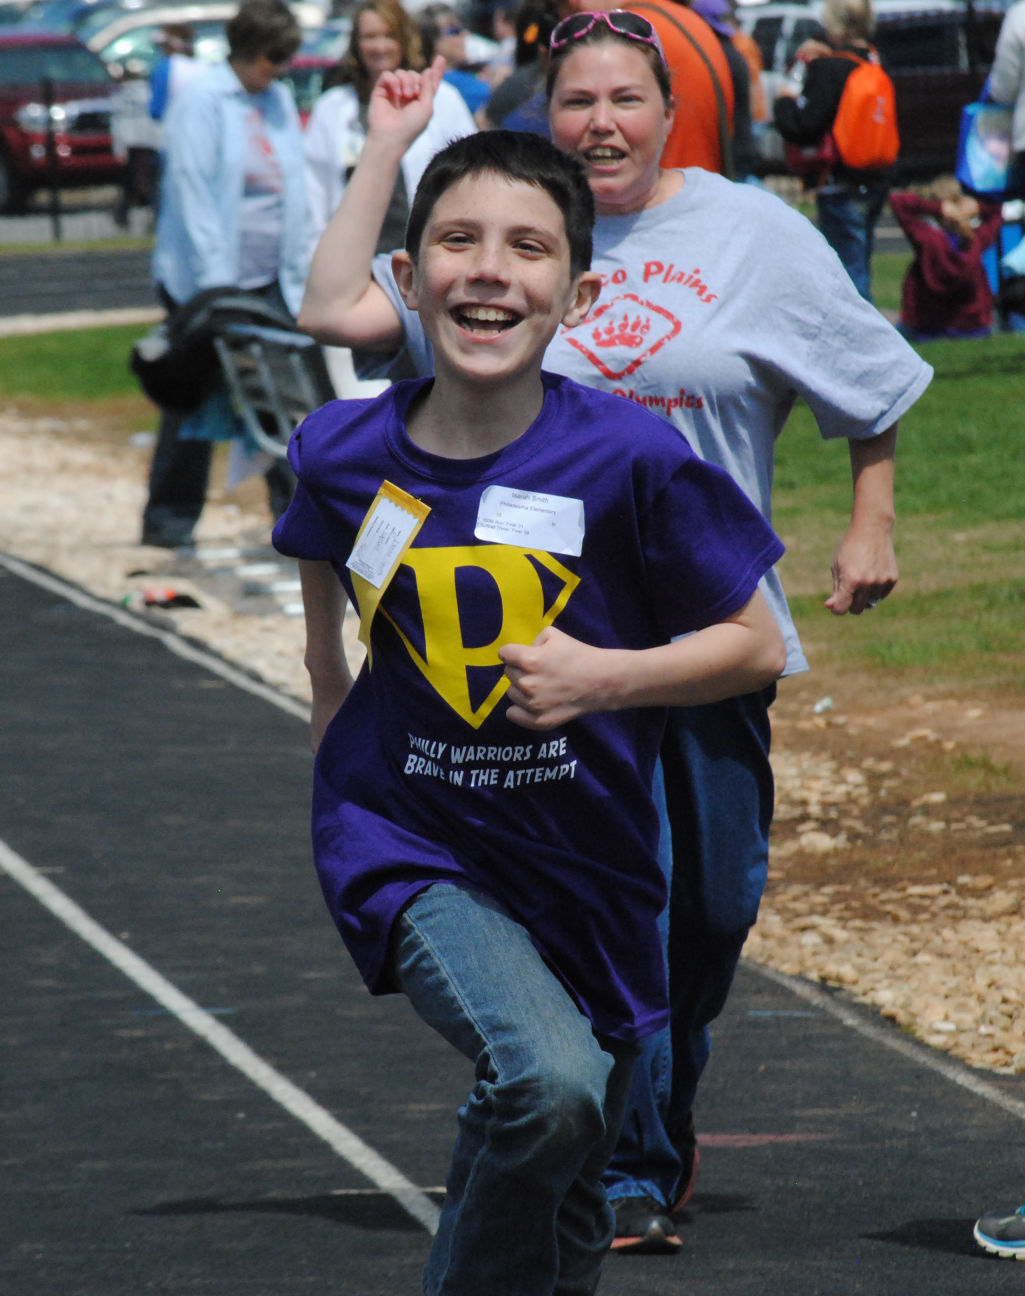 The joy of Special Olympics